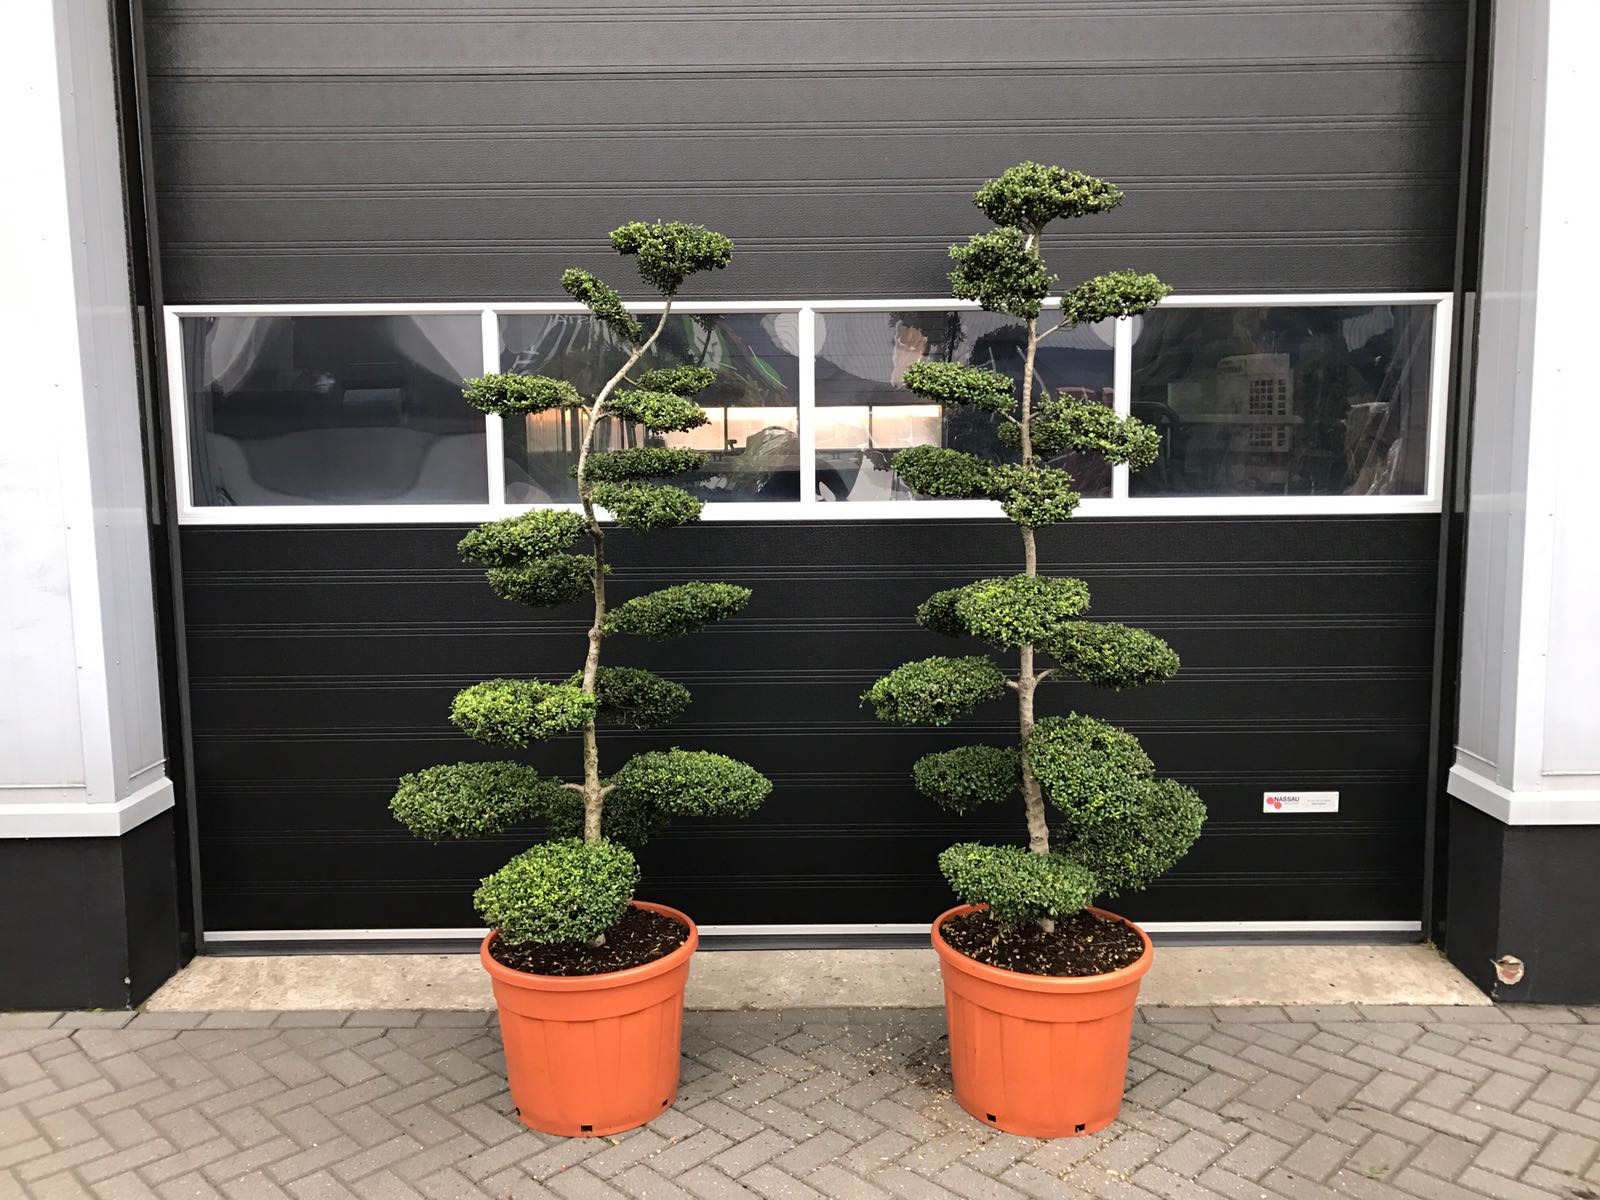 ilex crenata bonsai 150 175 cm pwm mandemakers garden plants. Black Bedroom Furniture Sets. Home Design Ideas